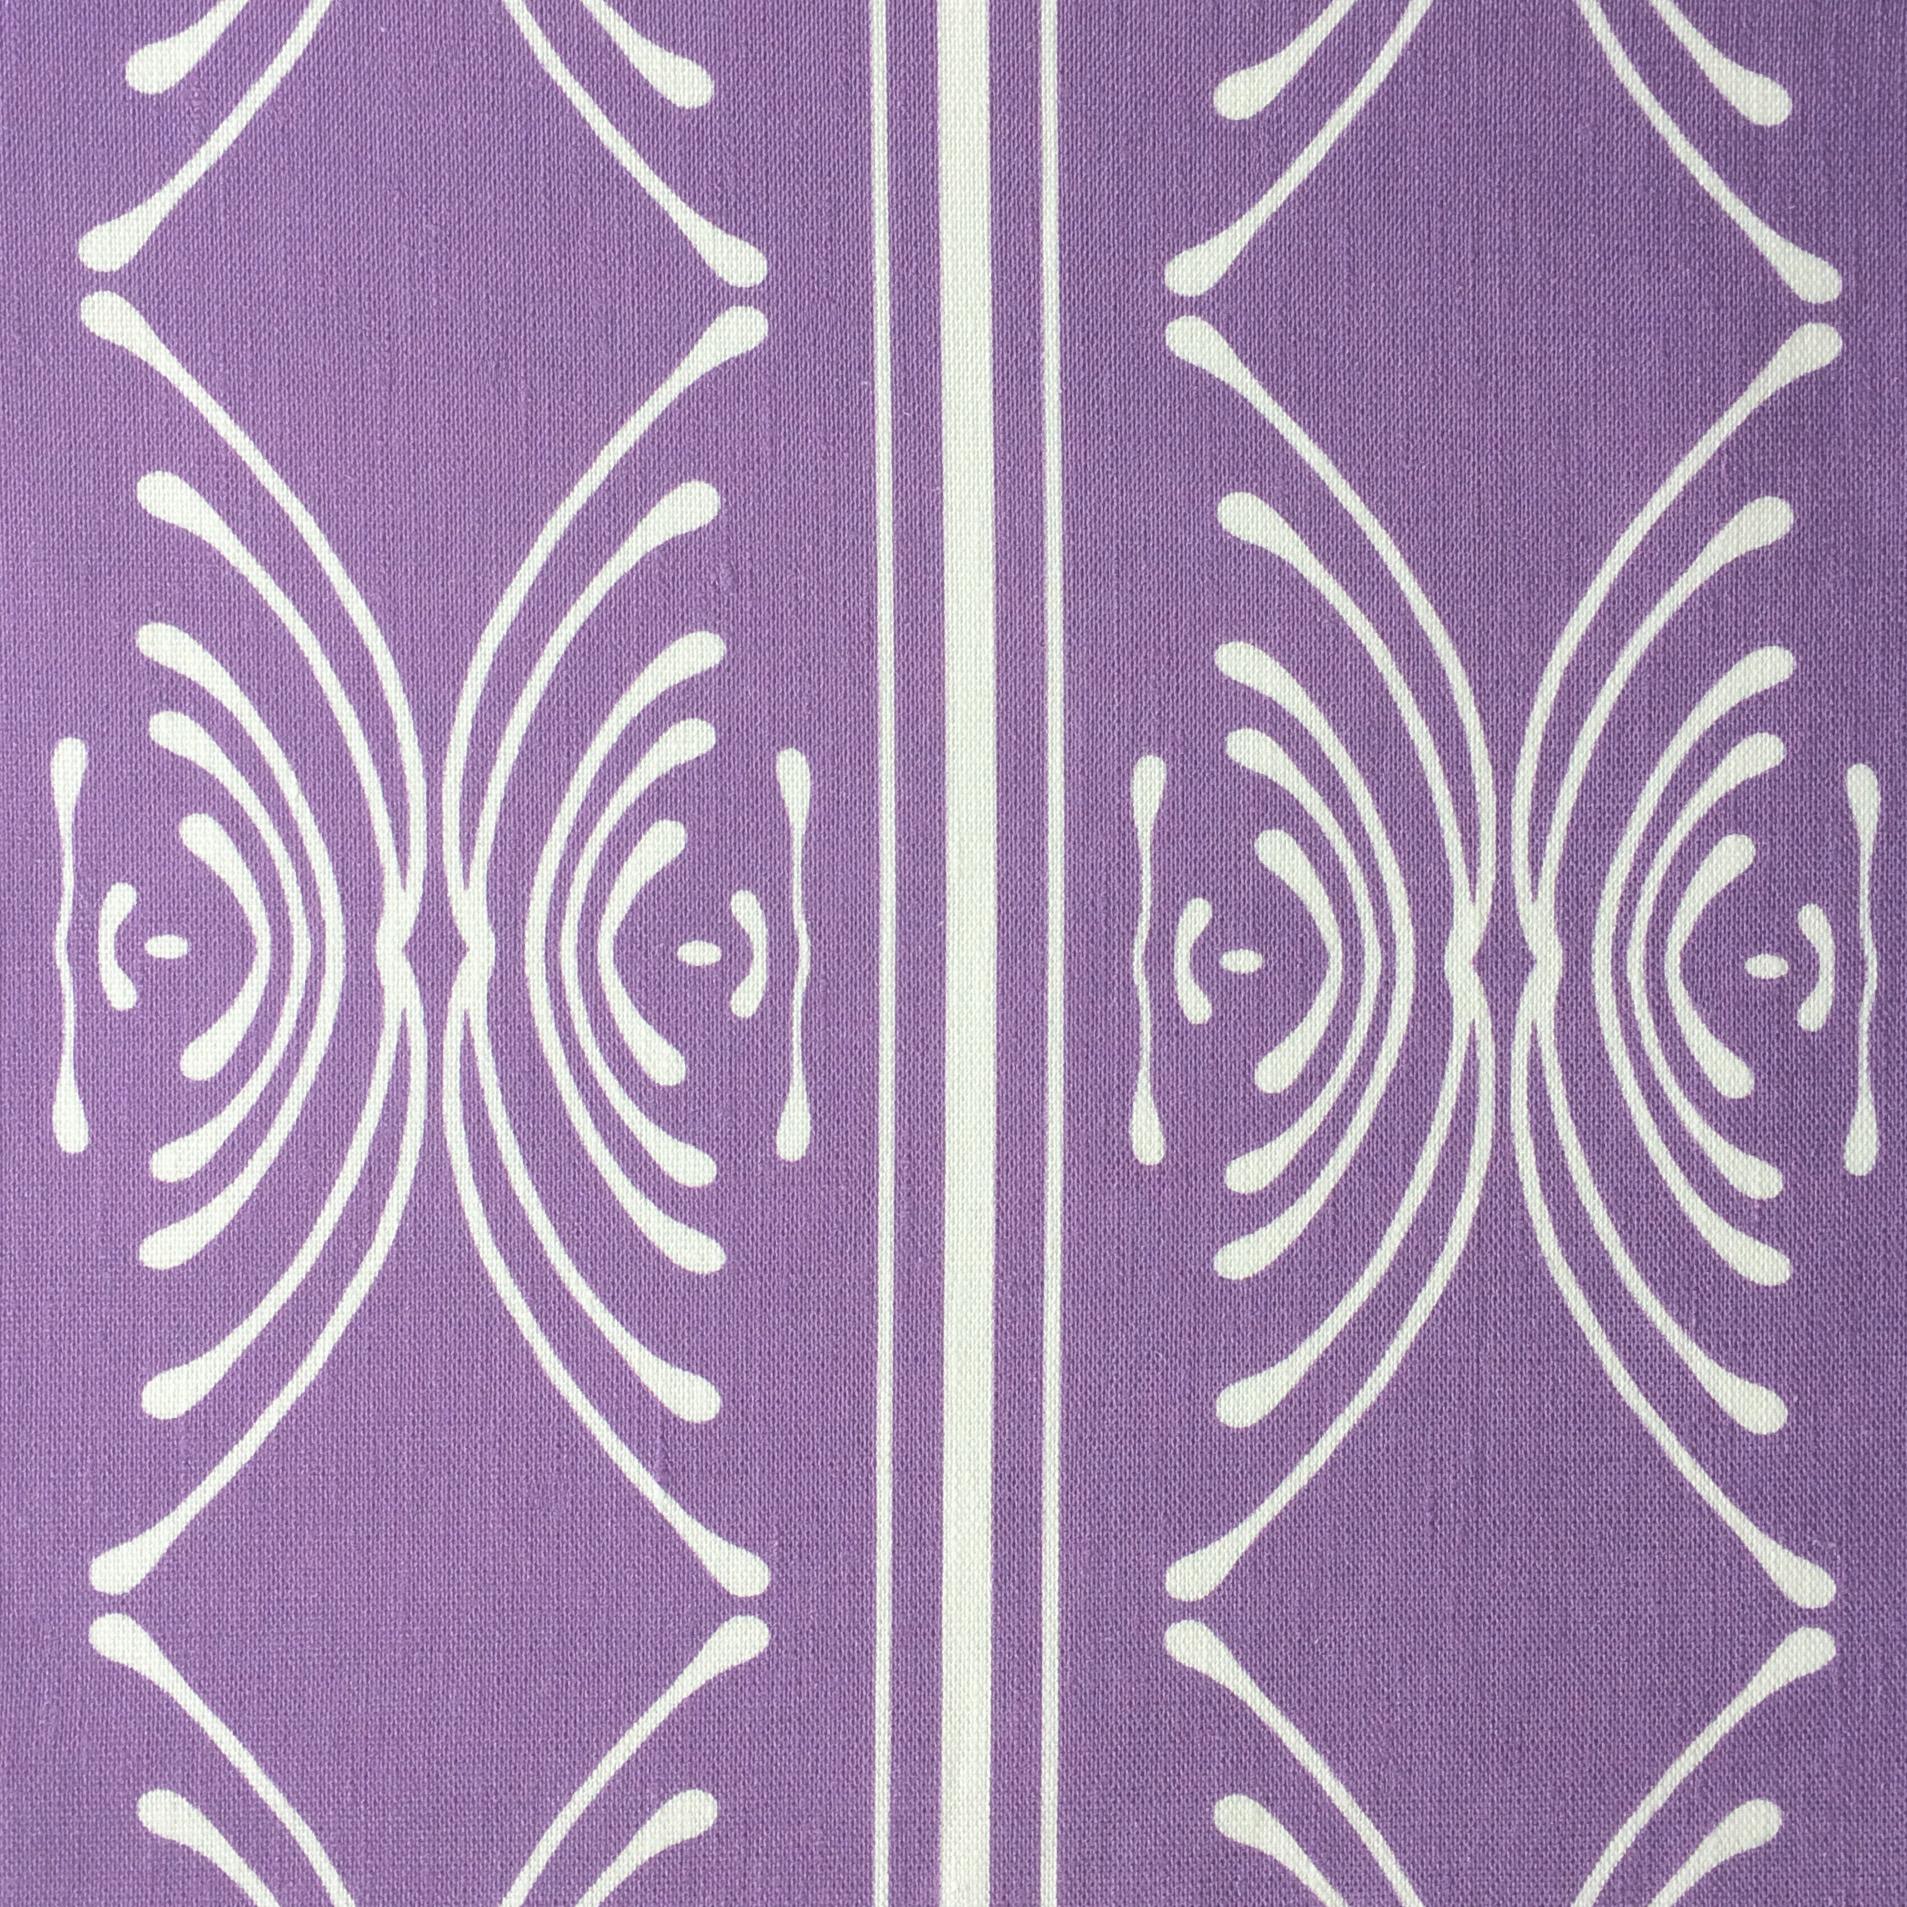 Large Kris Kross: Lilac